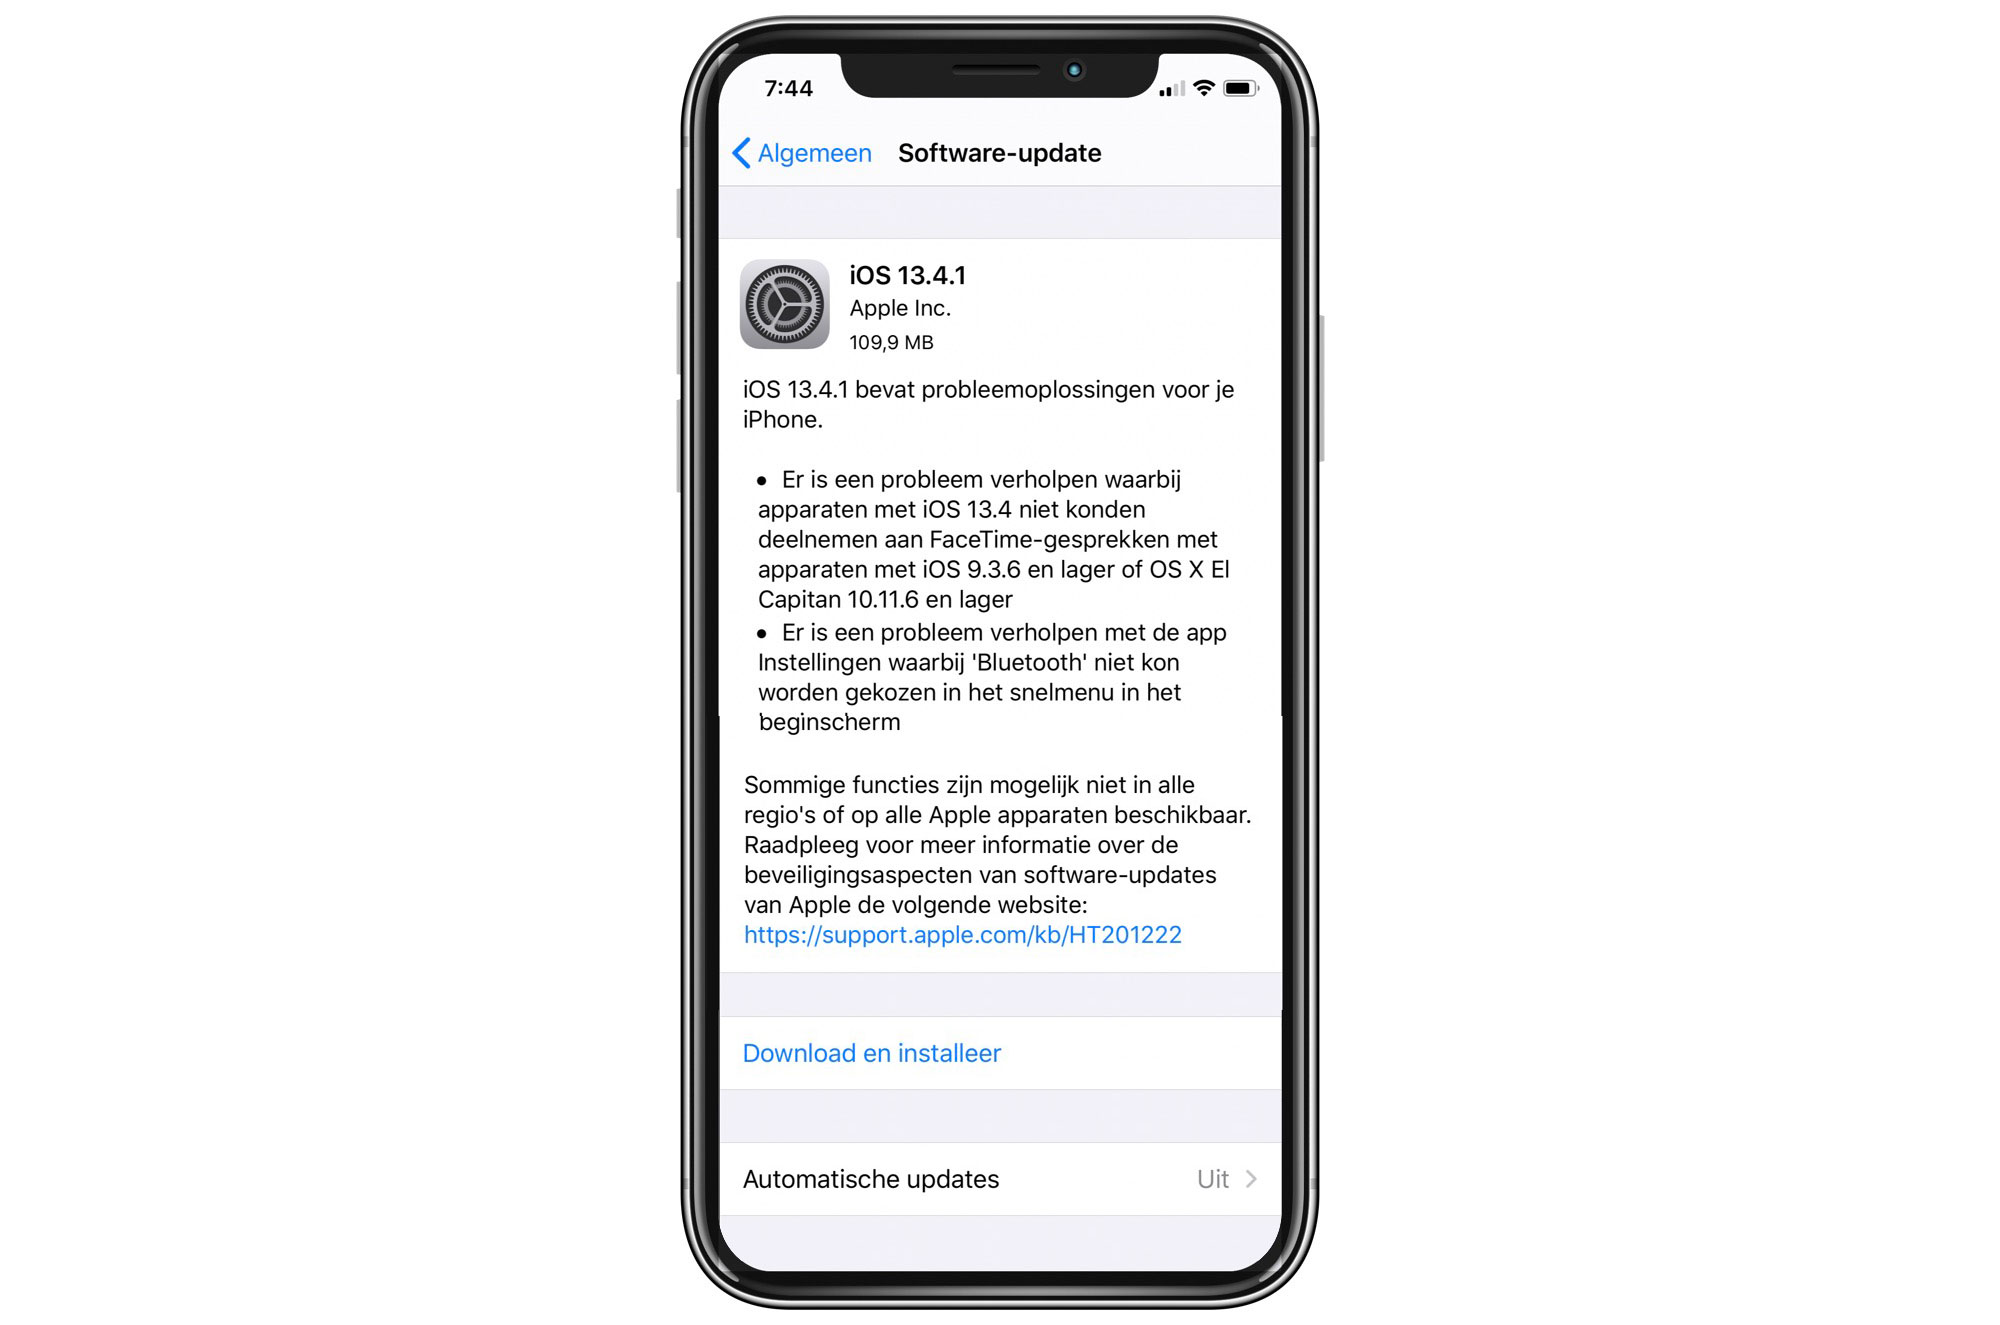 https://www.macfreak.nl/modules/news/images/zArt.iOS13.4.1ReleaseNotes.jpg